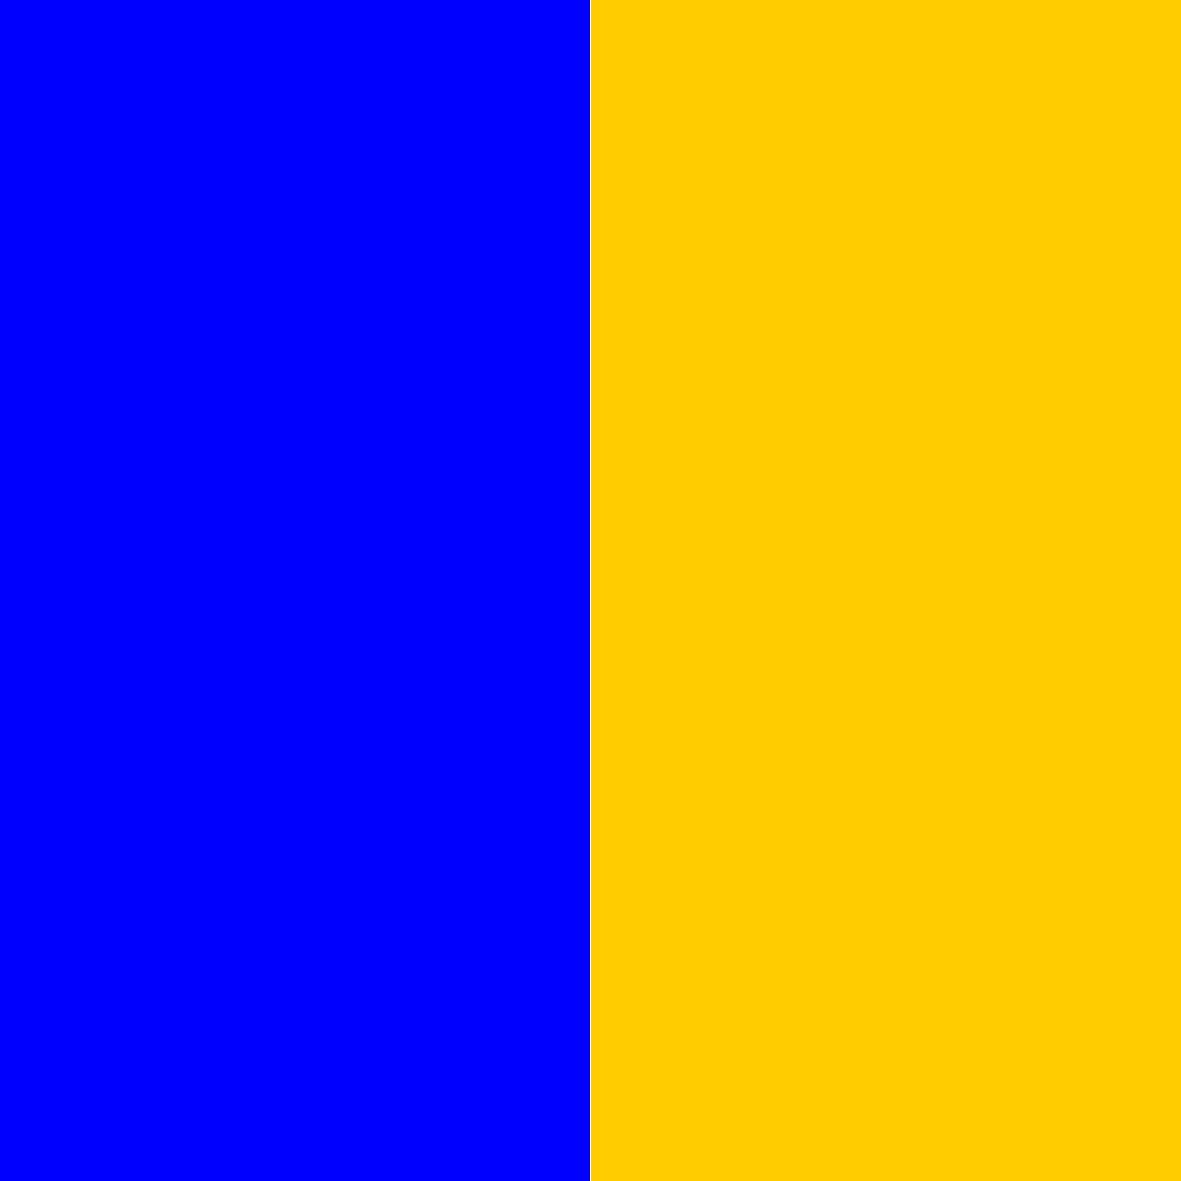 синий/желтый_0000FF/FFCC00